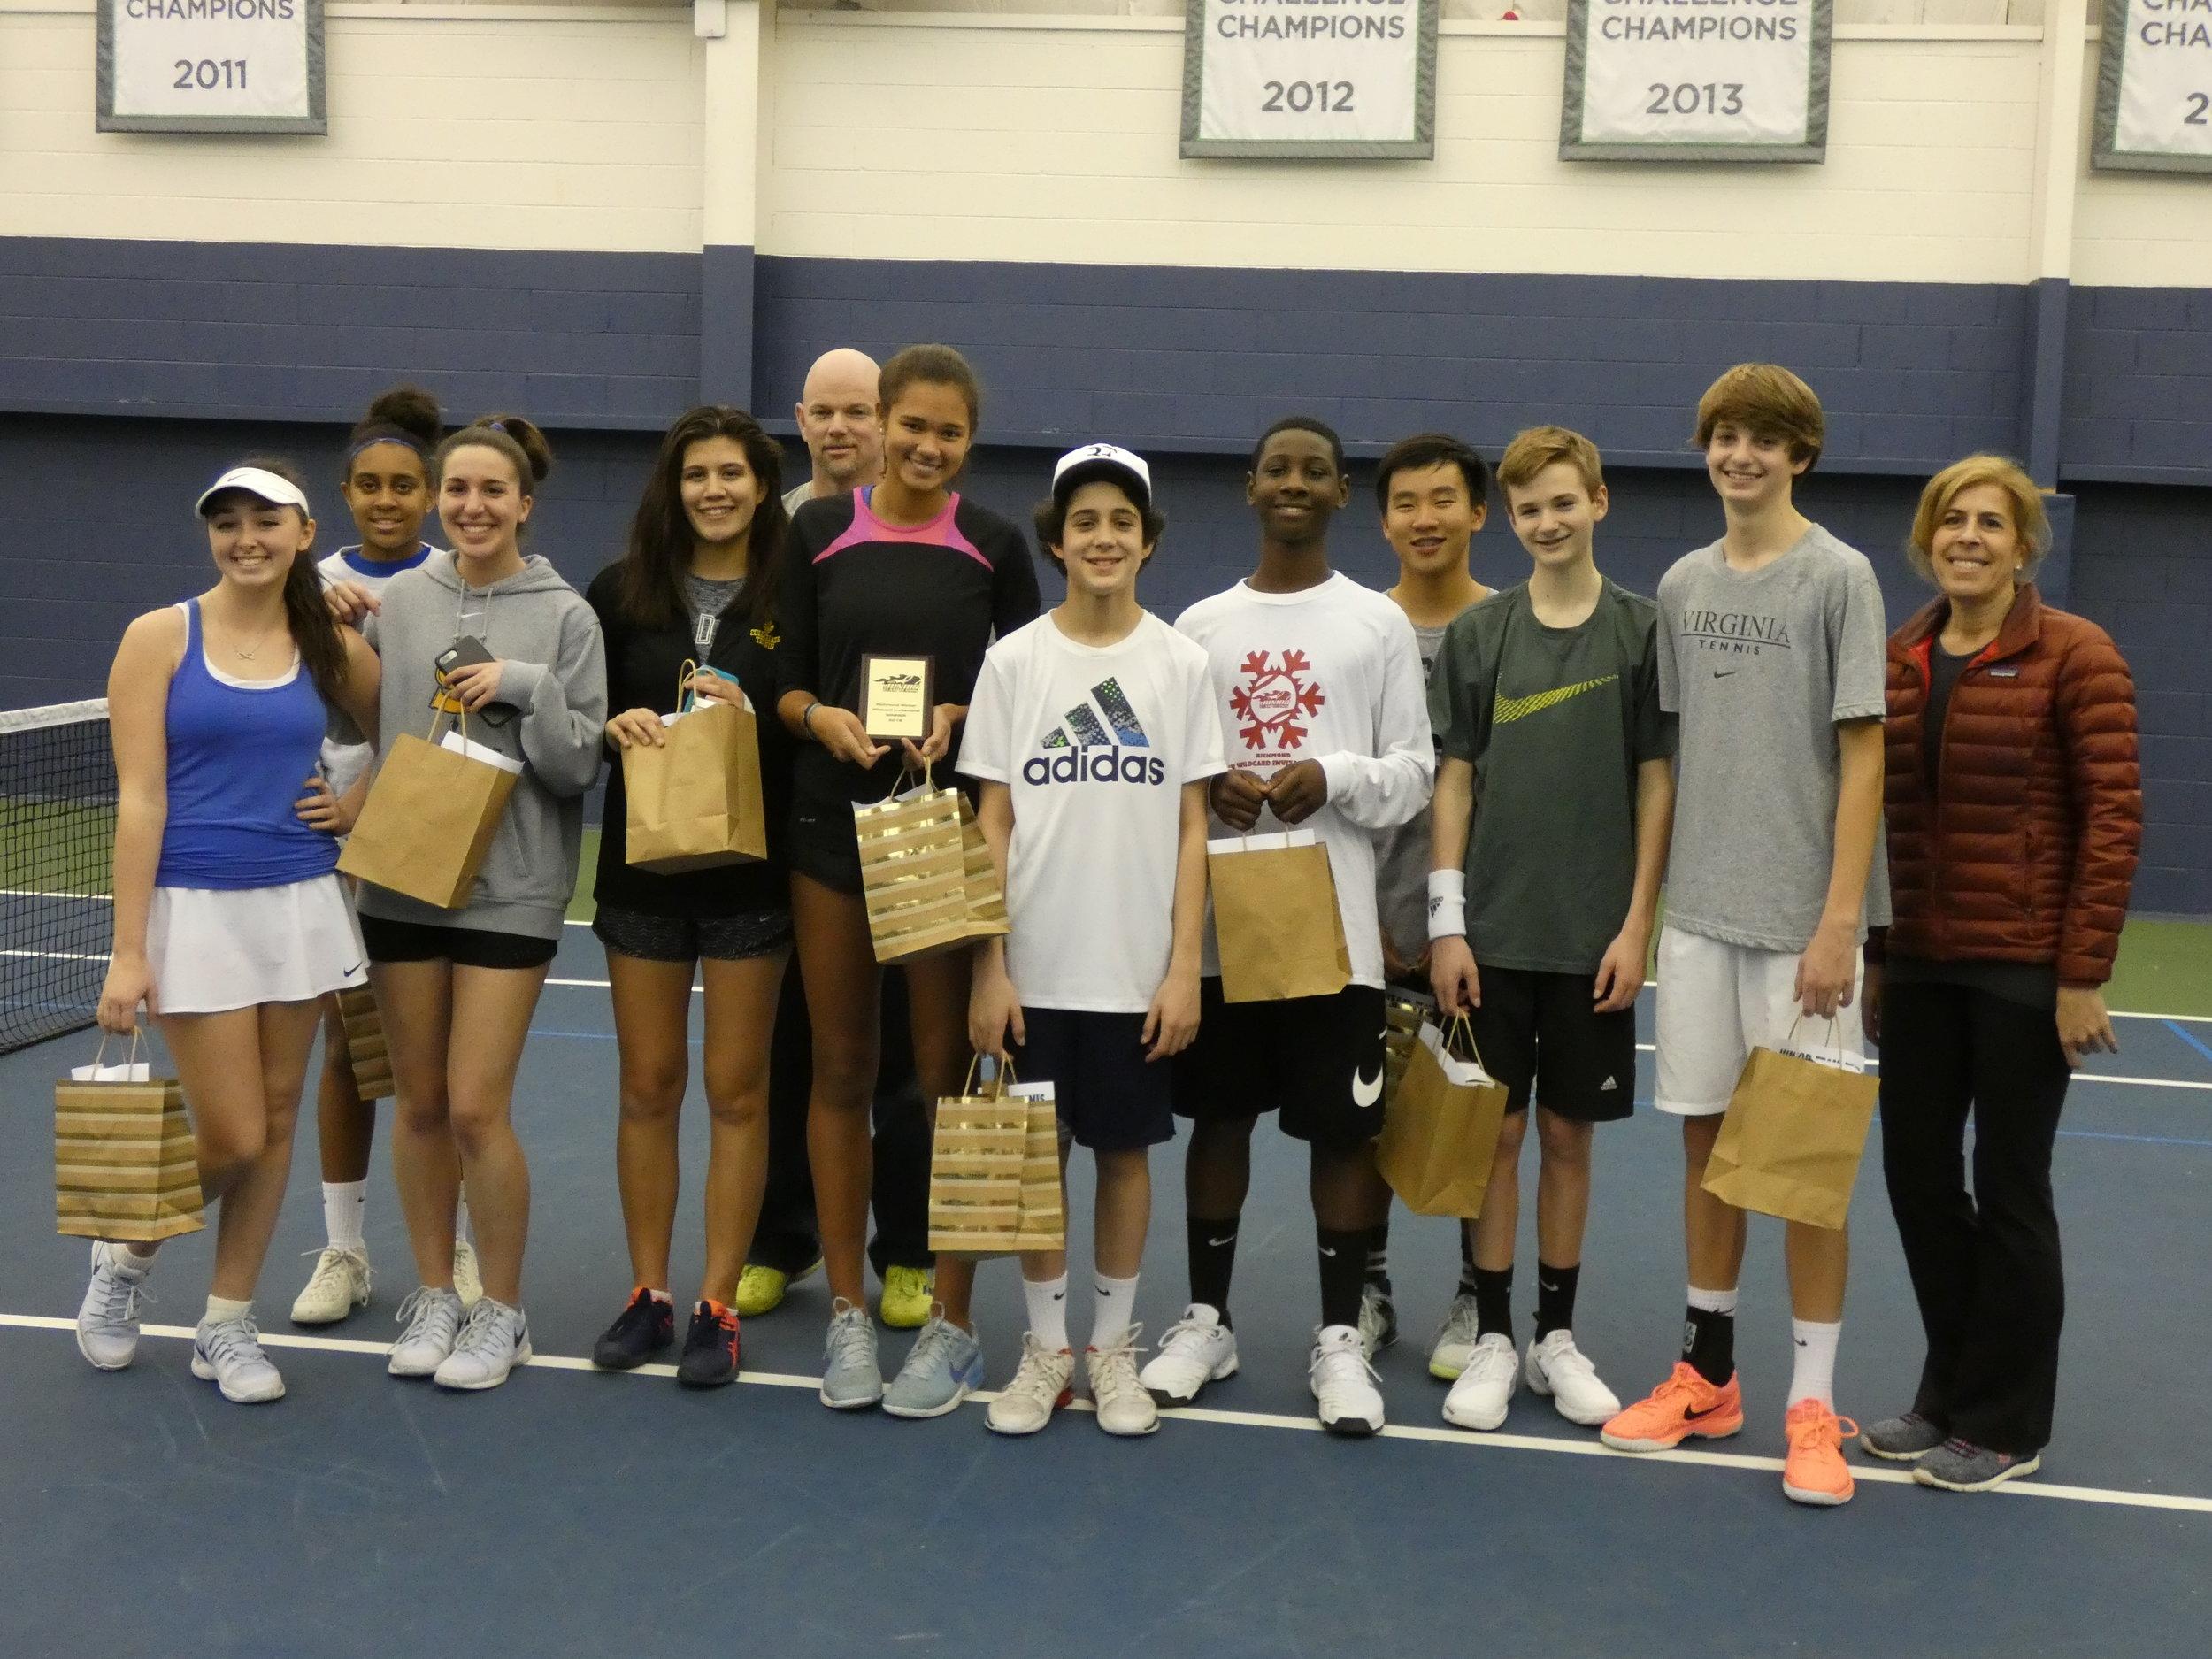 Raintree Monroe/Campbell 18 advanced wins the Junior Team Tennis Wild Card Tournament 2/11/18